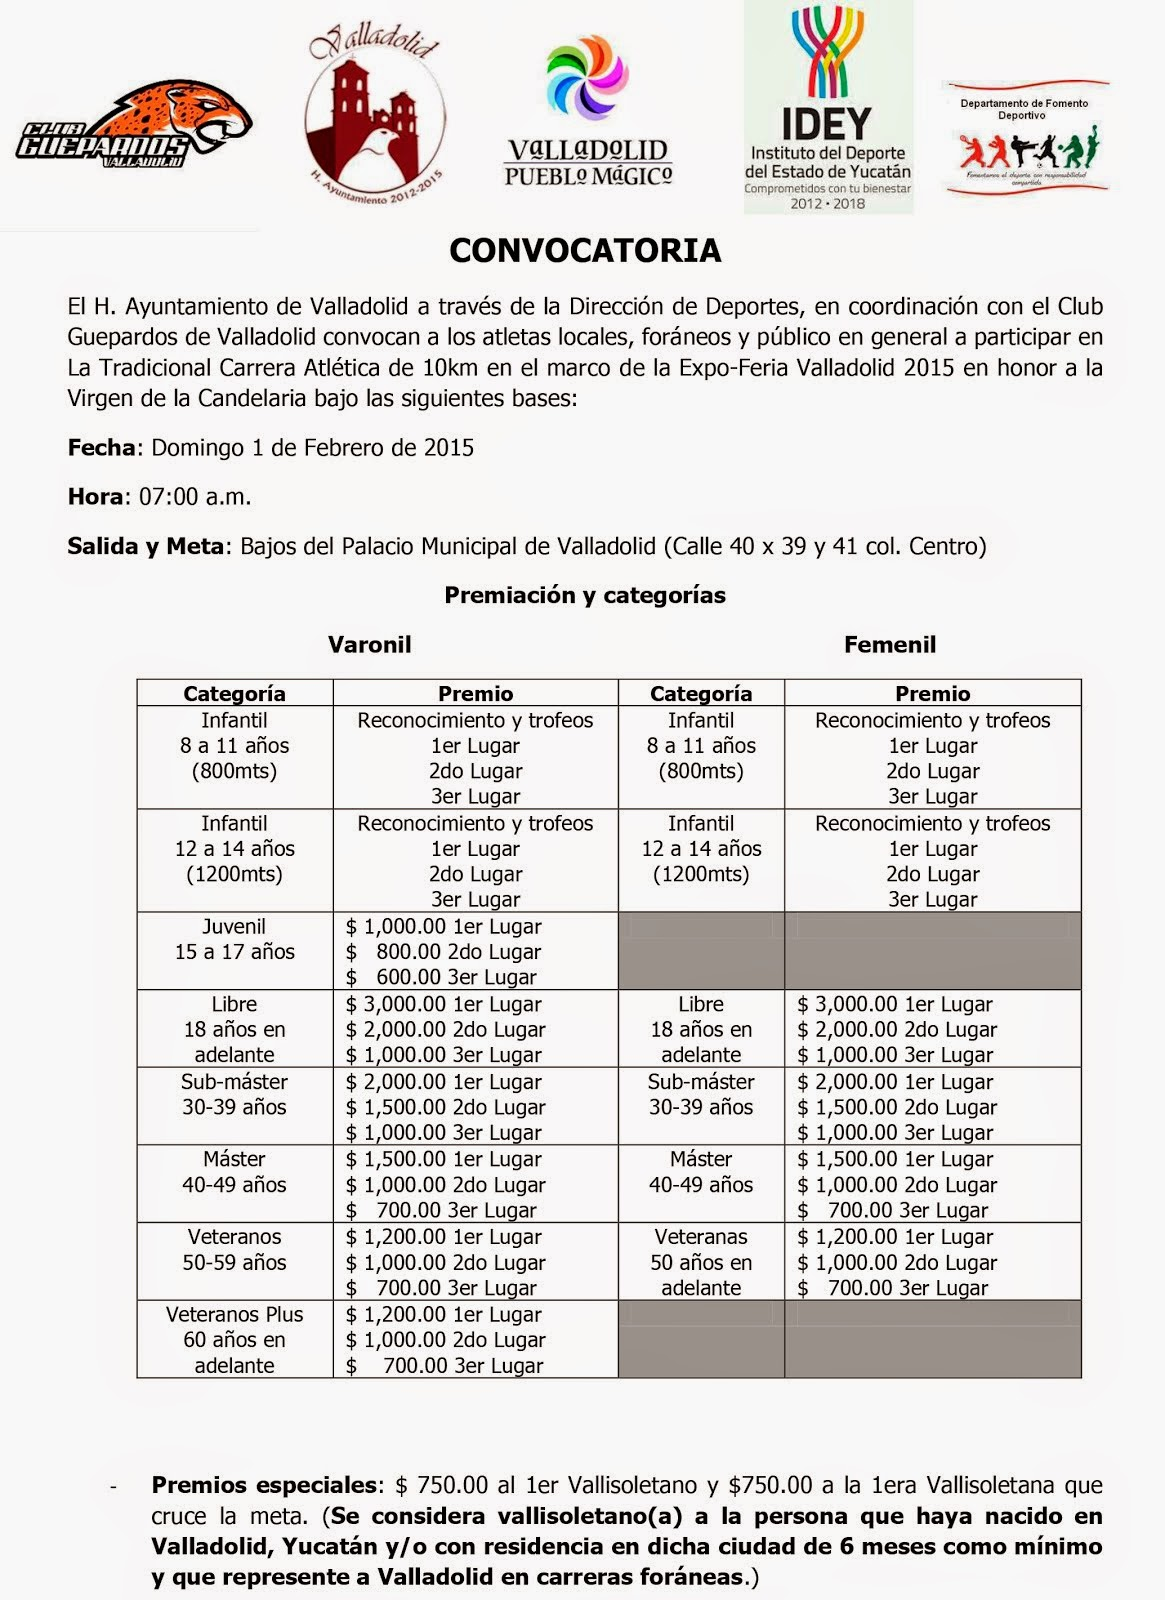 Carrera de la Candelaria 2015